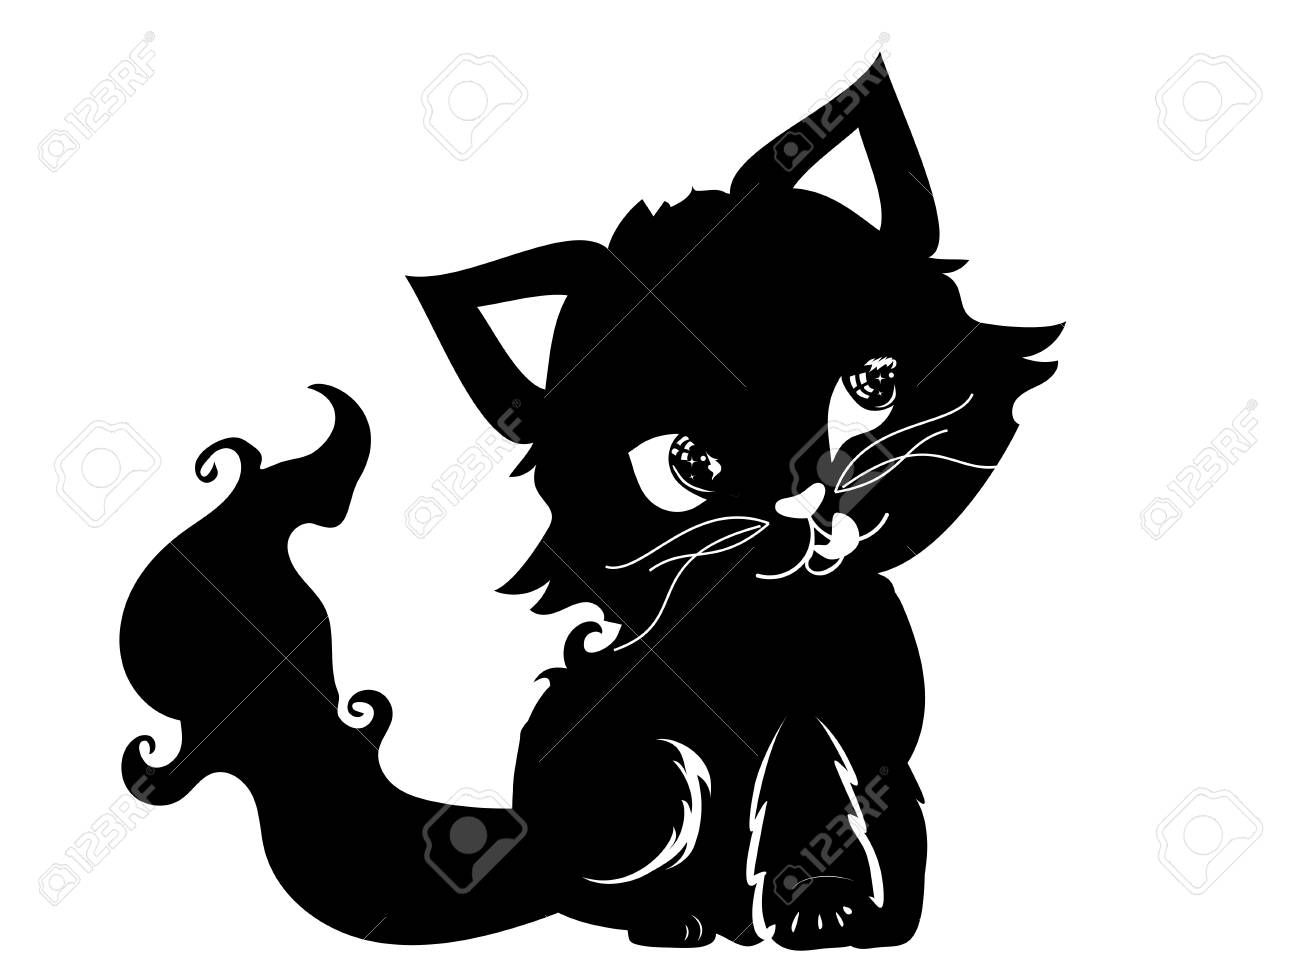 Halloween Black Kitten Cute Cartoon Cat Design Black Cat Kitten Halloween Png Clipart Animals Animat Black Cat Halloween Black Cat Pictures Black Cat Artwork